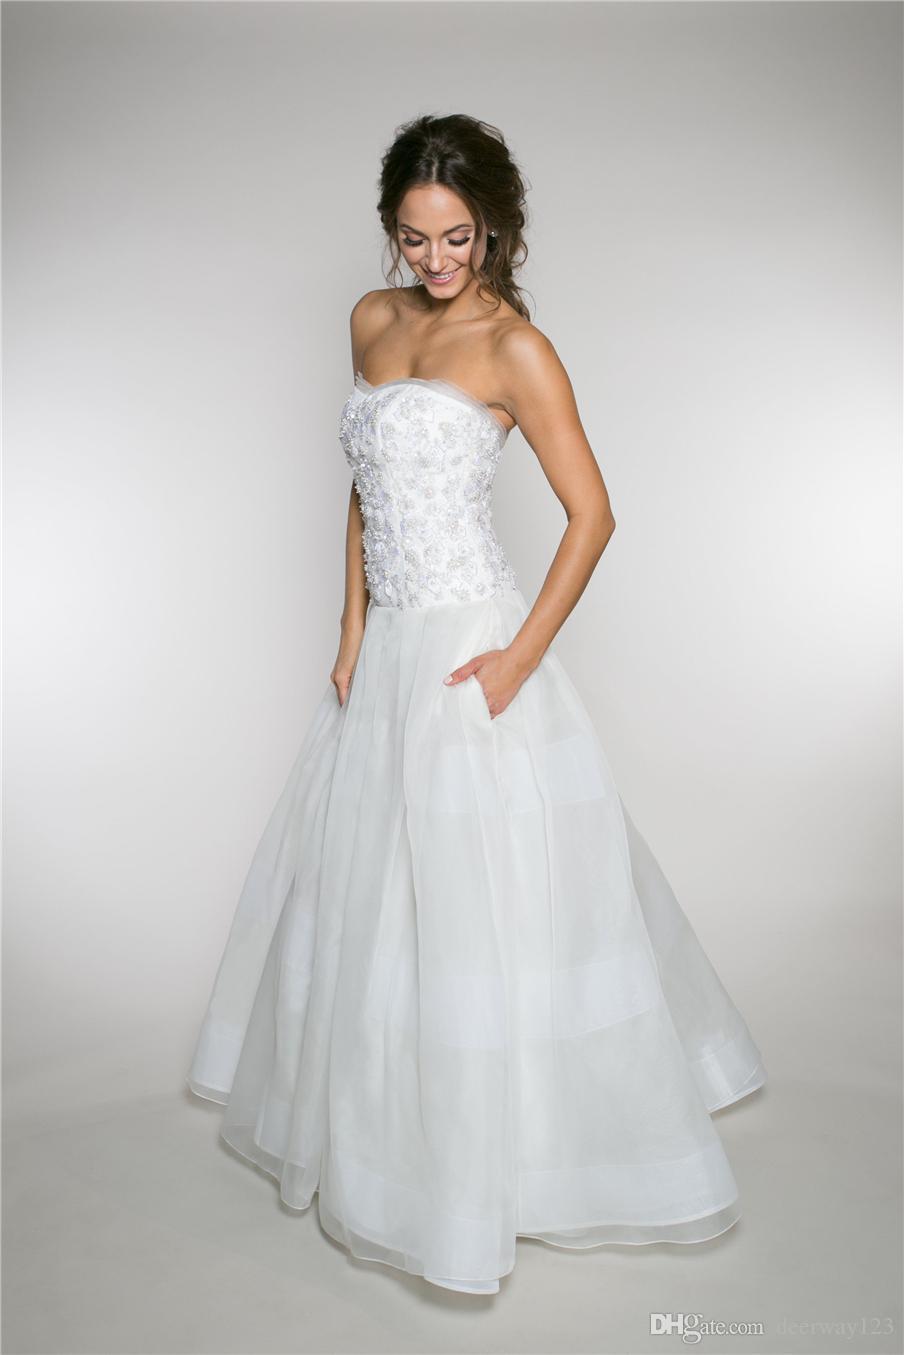 Beaded Sweetheart Bodice Dropped Waist a-Line Wedding Dress 3d Flowers Applique Crystals Bridal Dress Vestido De Noiva